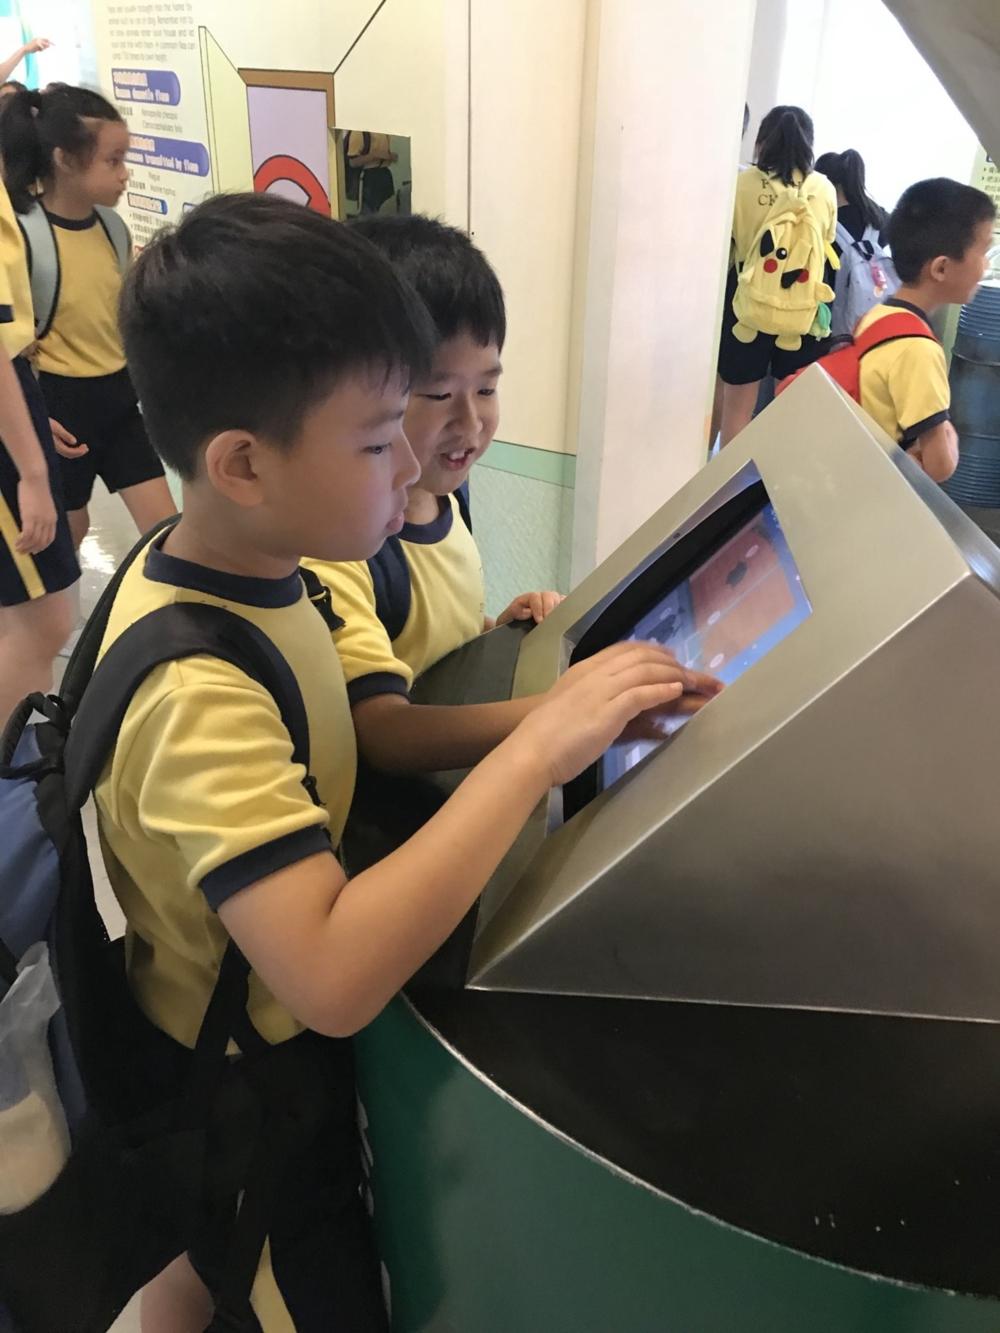 http://pohckwps.edu.hk/sites/default/files/61_5.jpg